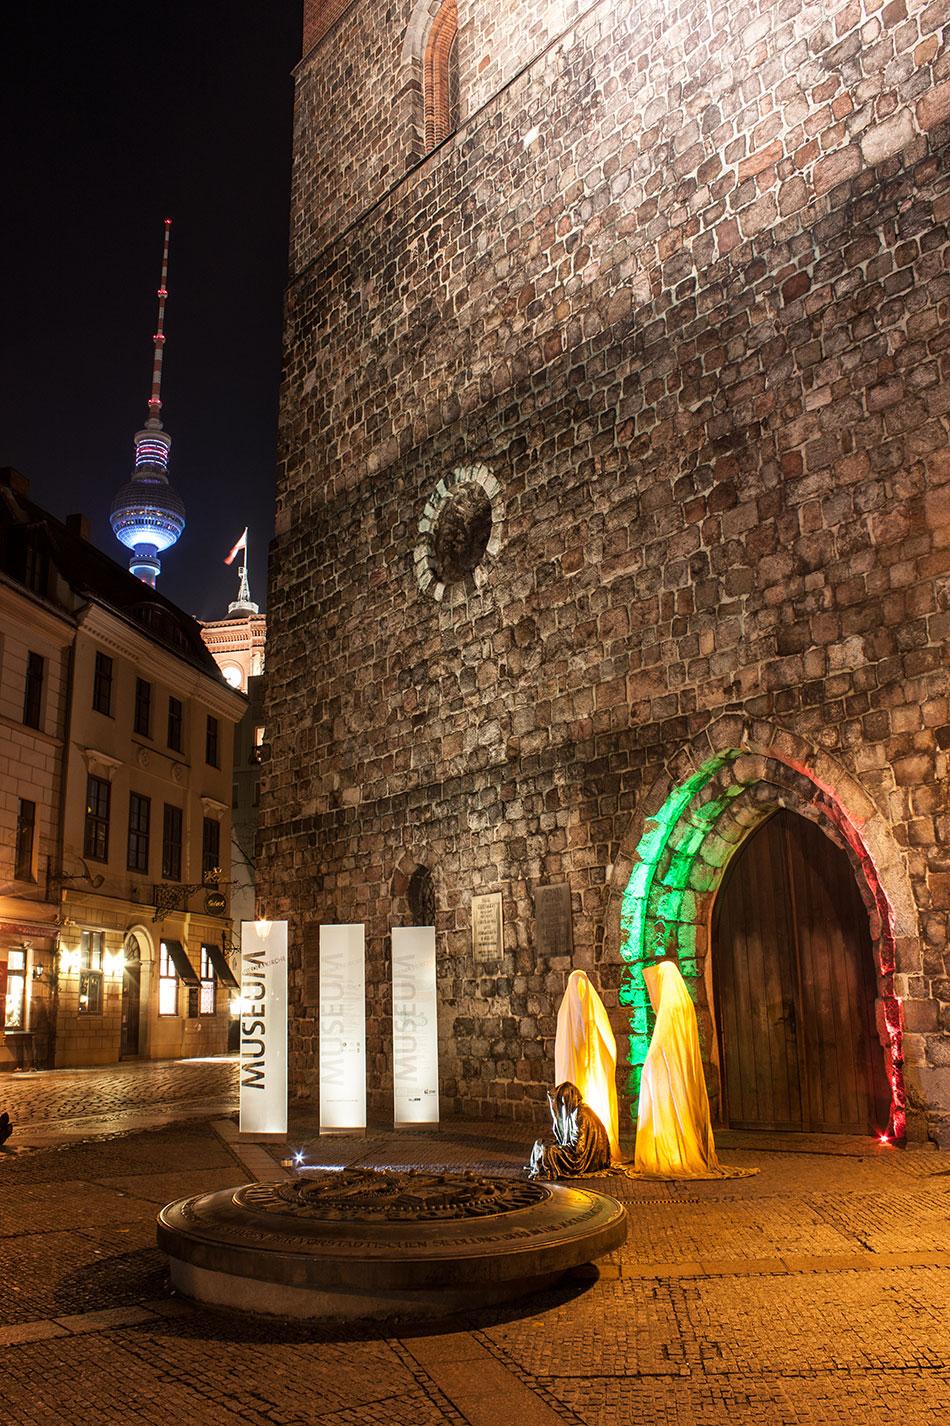 festival-of-lights-berlin-light-art-festival-contemporary-fine-art-design-show-guardiansof-time-manfred-kili-kielnhofer-sculpture-3711